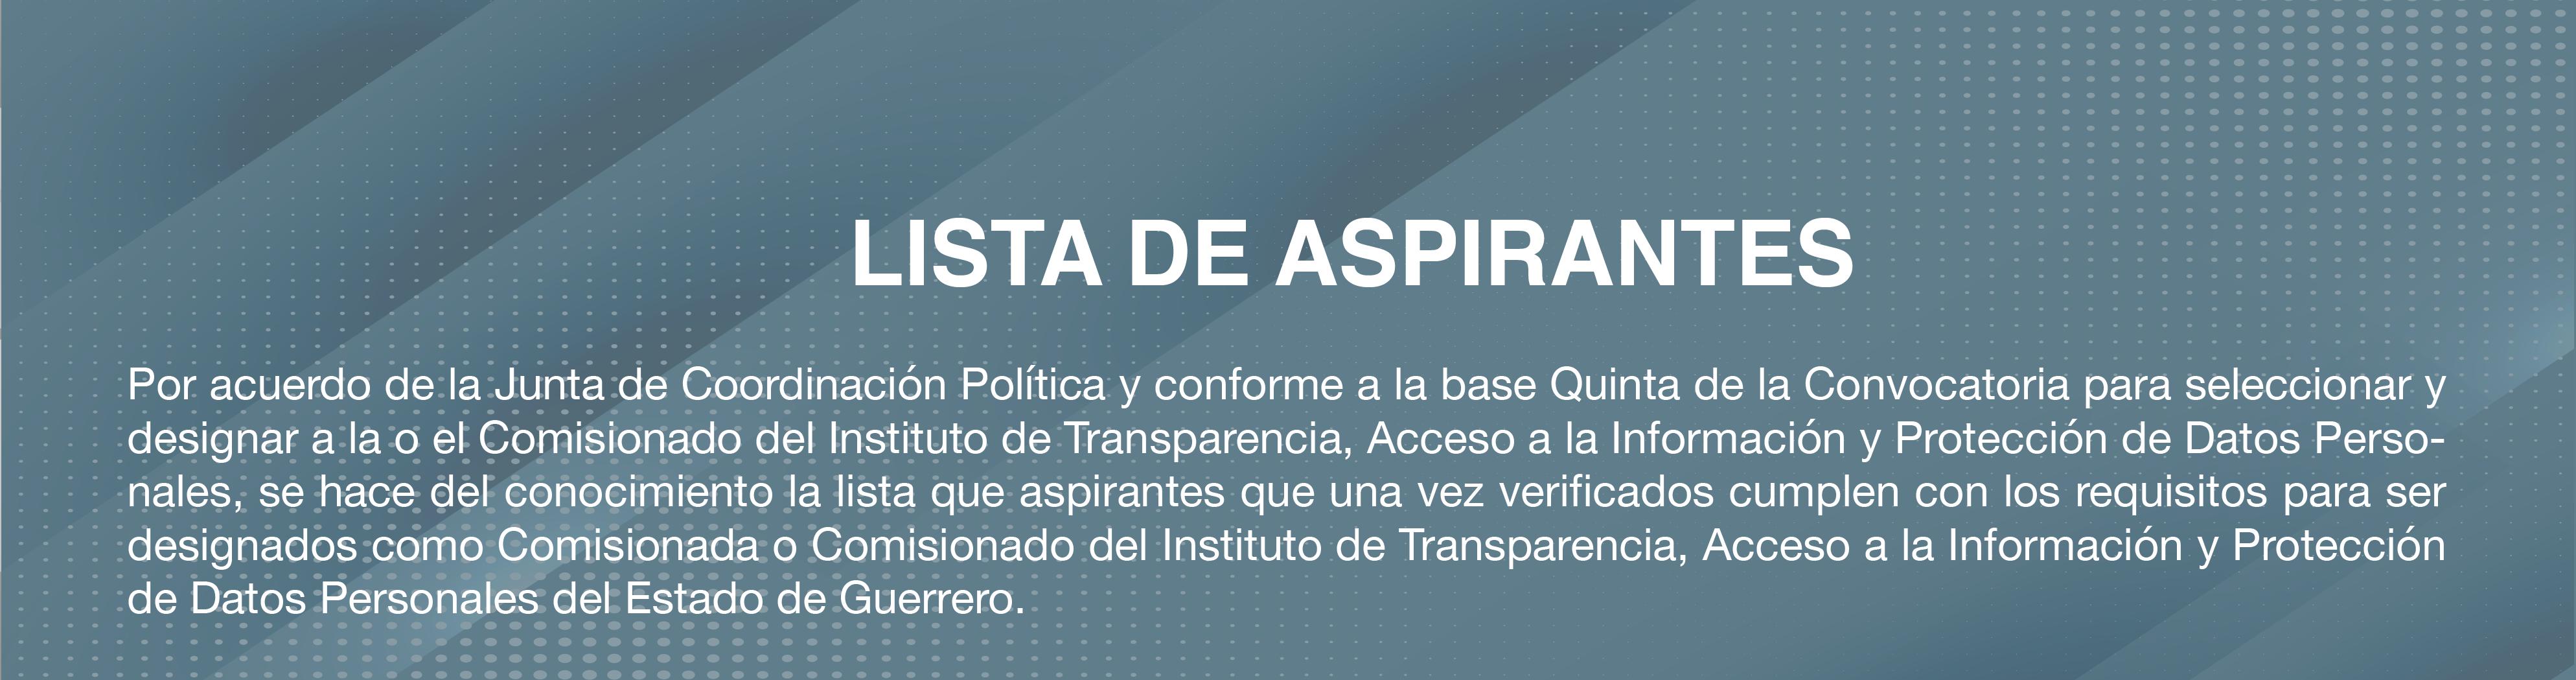 http://congresogro.gob.mx/62/inicio/wp-content/uploads/2021/04/LISTA-ASPIRANTES-F-ITAGRO-12.png